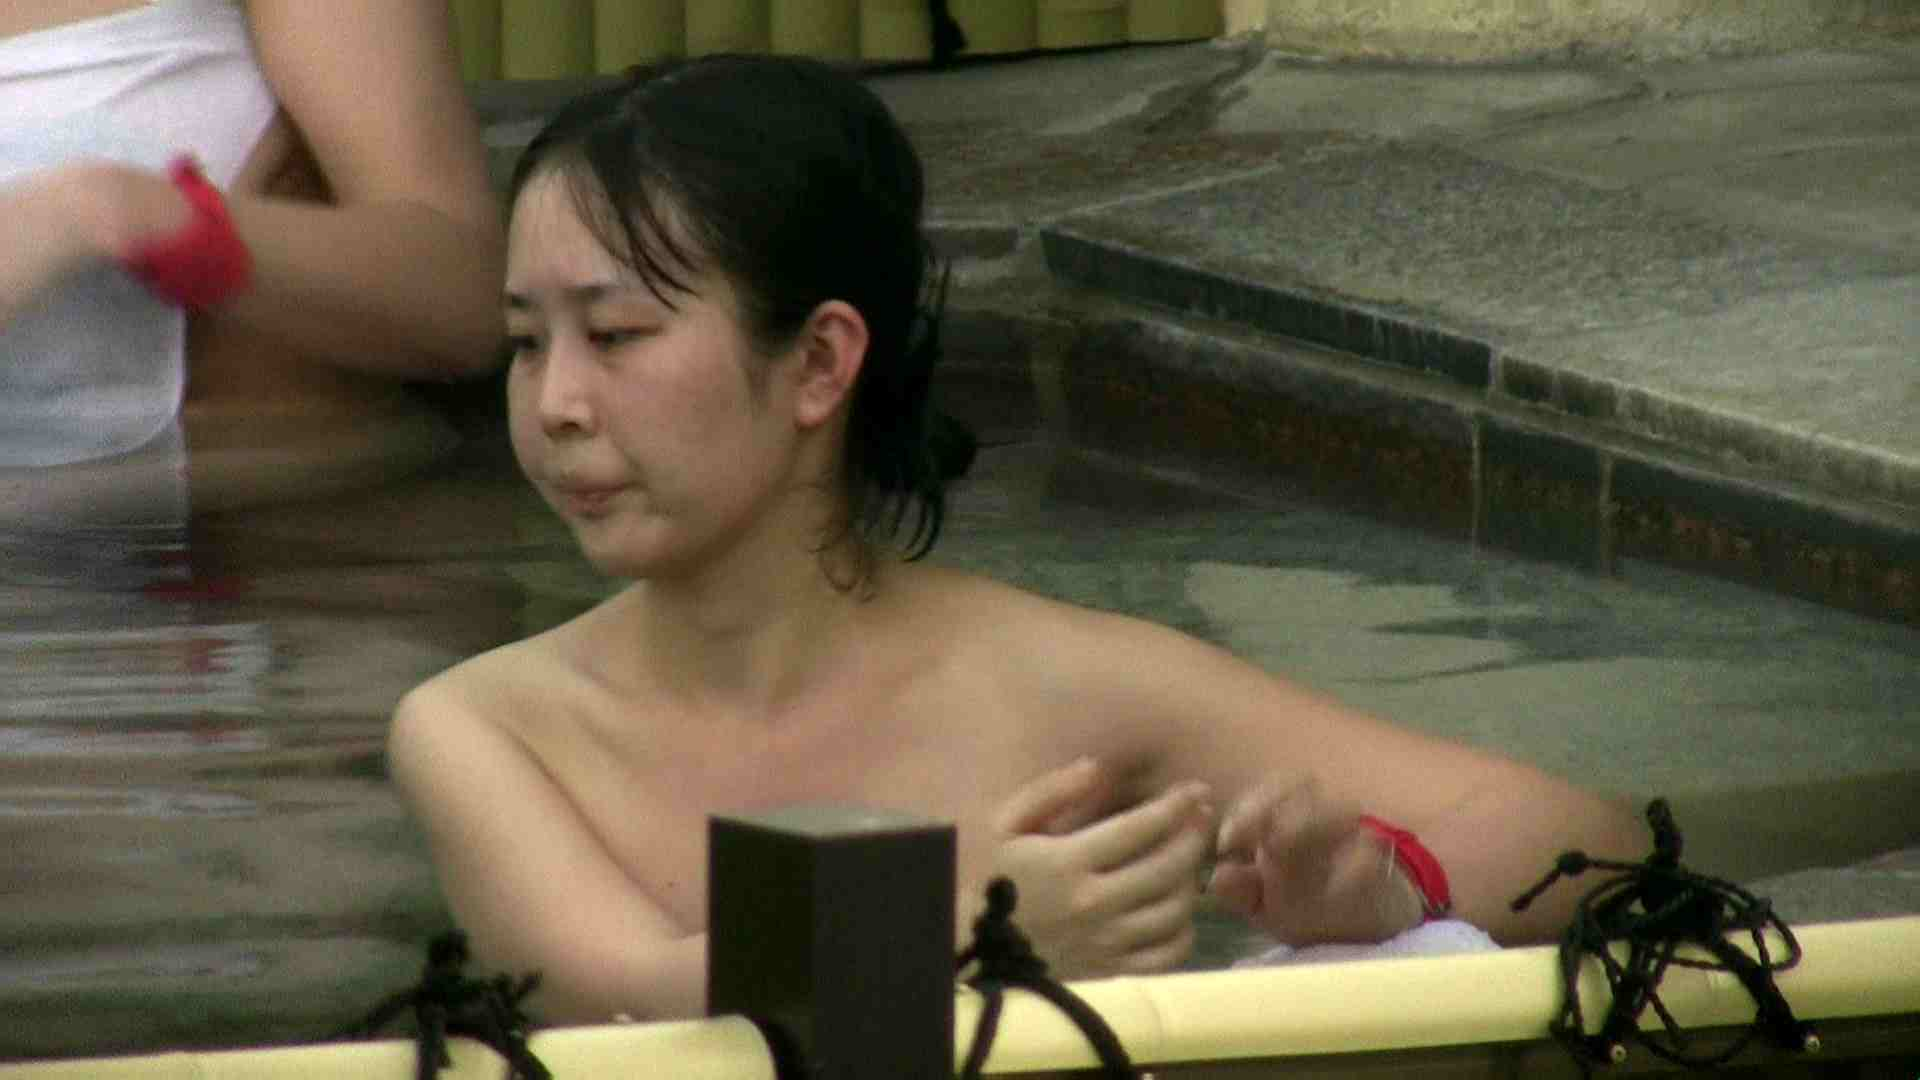 Aquaな露天風呂Vol.636 OL女体 | 露天  87連発 85